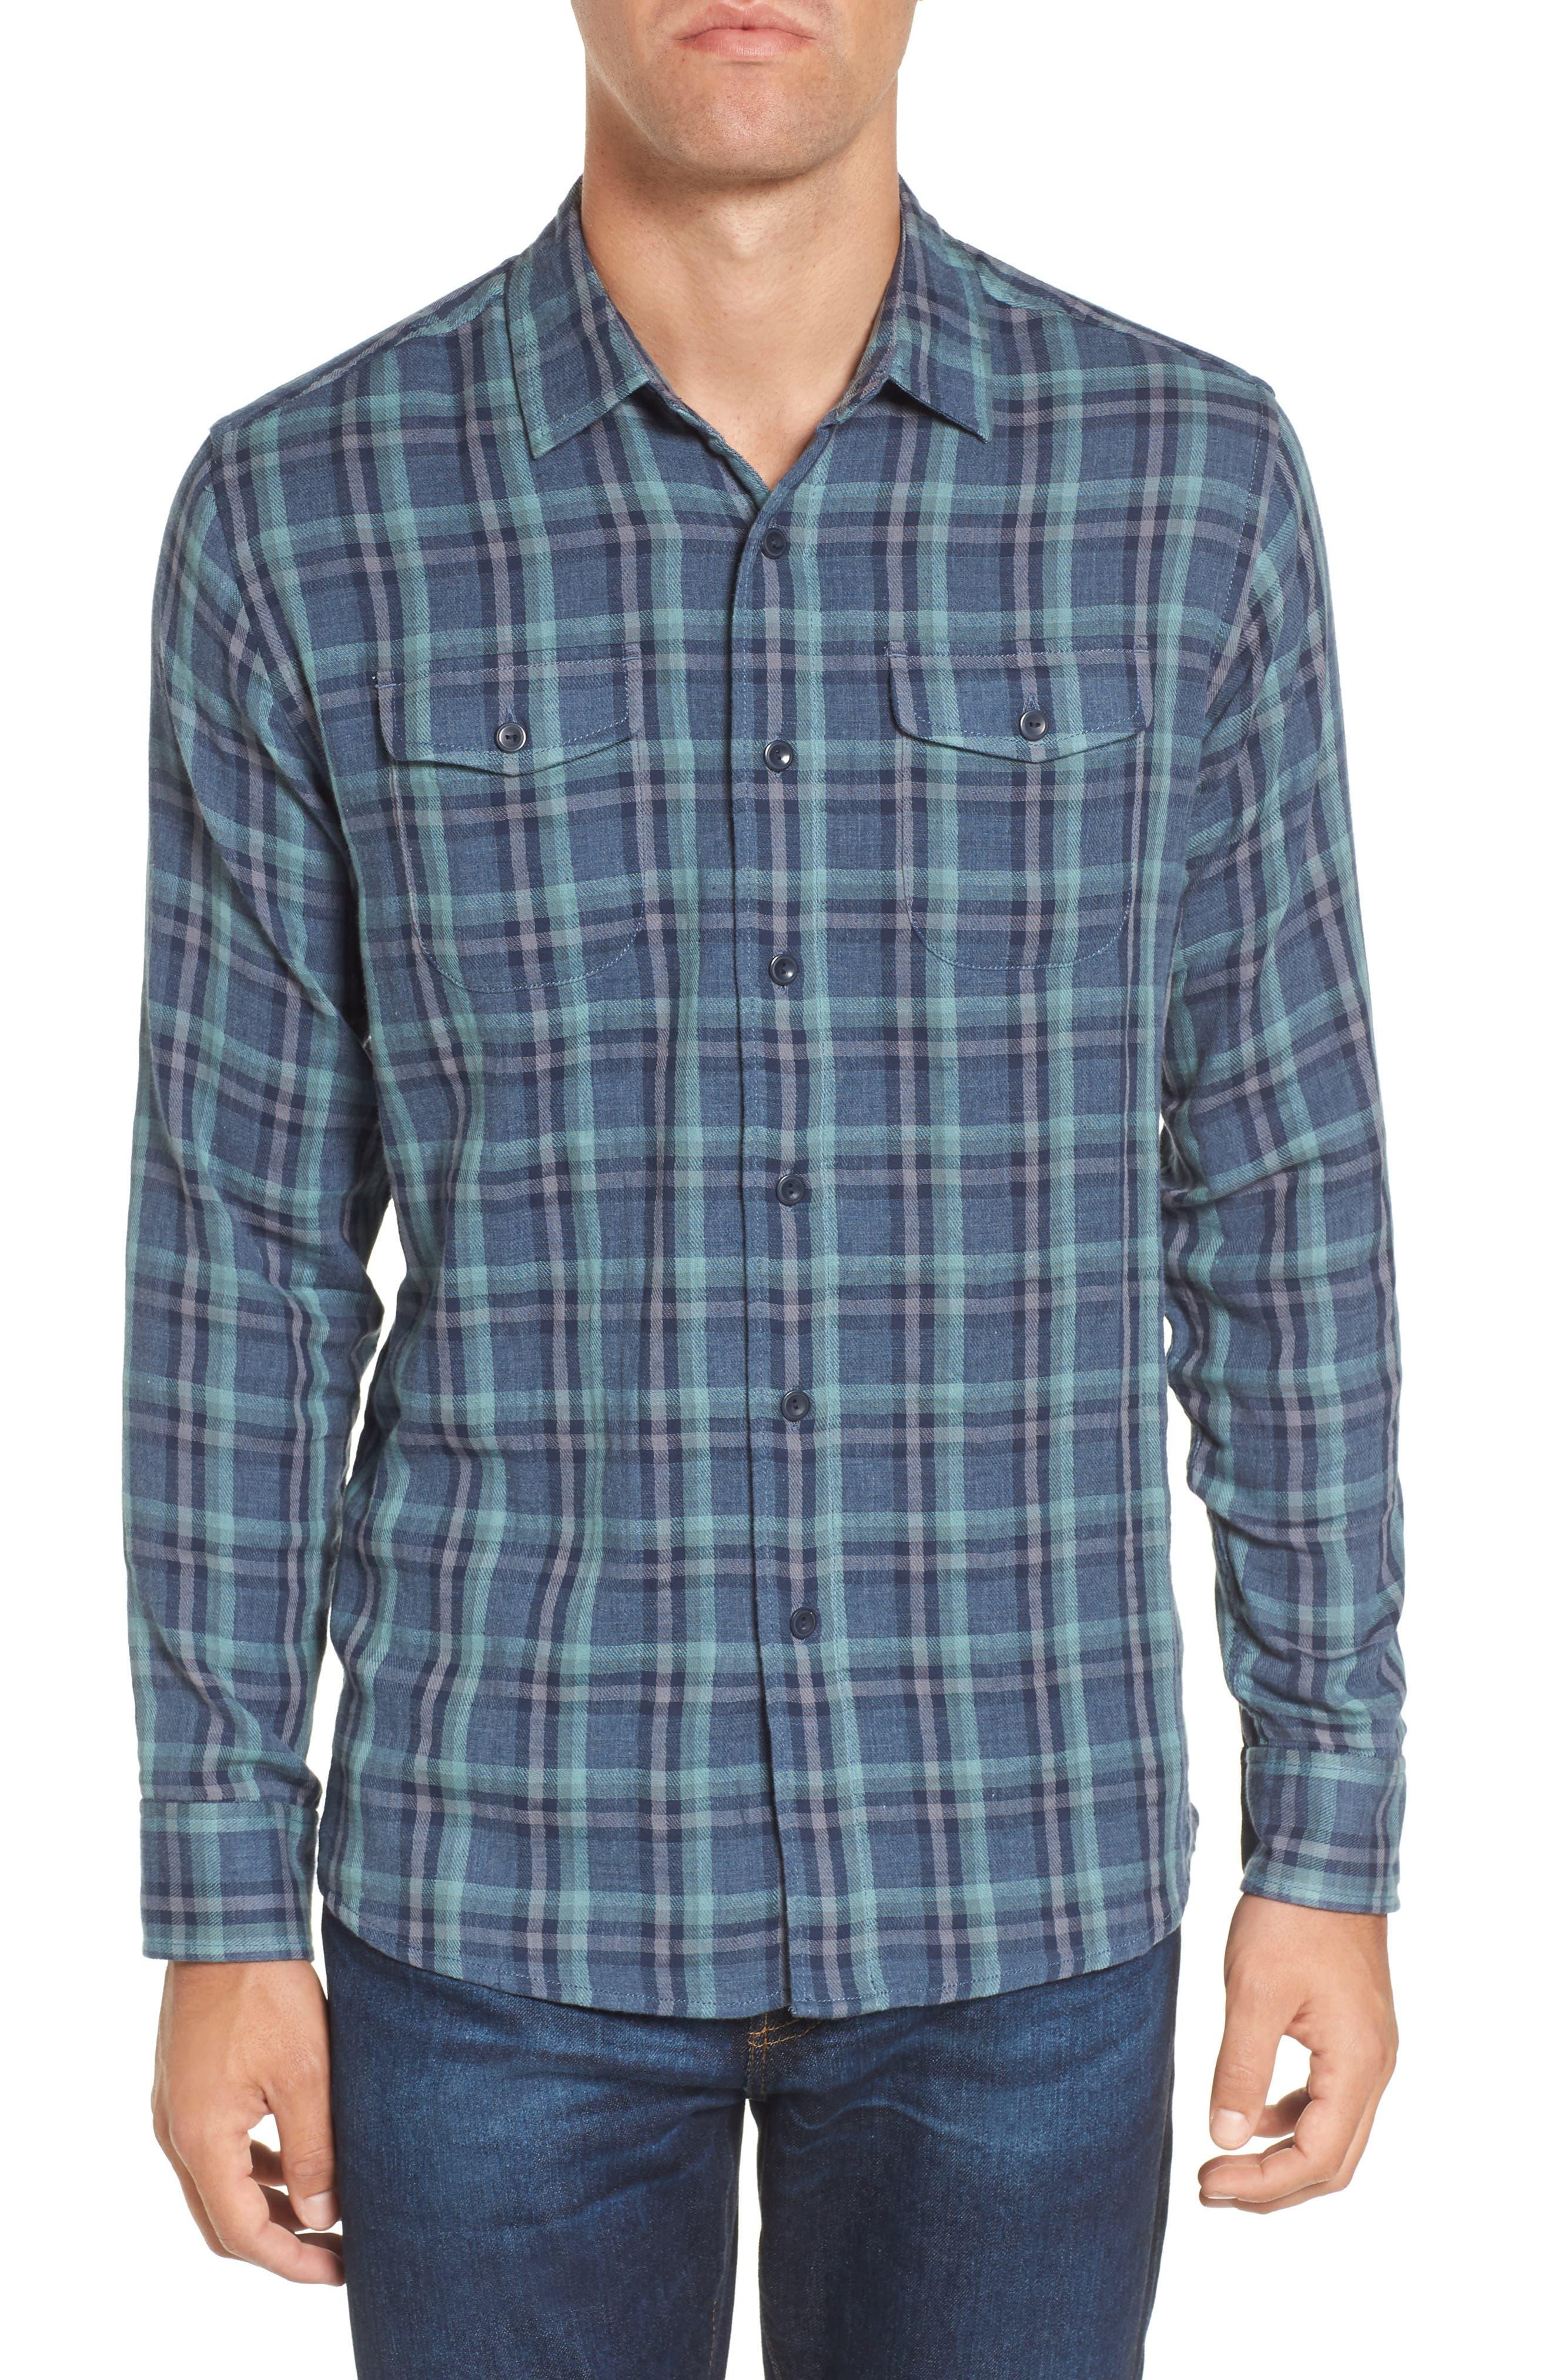 Smith Double Cloth Plaid Sport Shirt,                             Main thumbnail 1, color,                             Blue Navy Seafoam